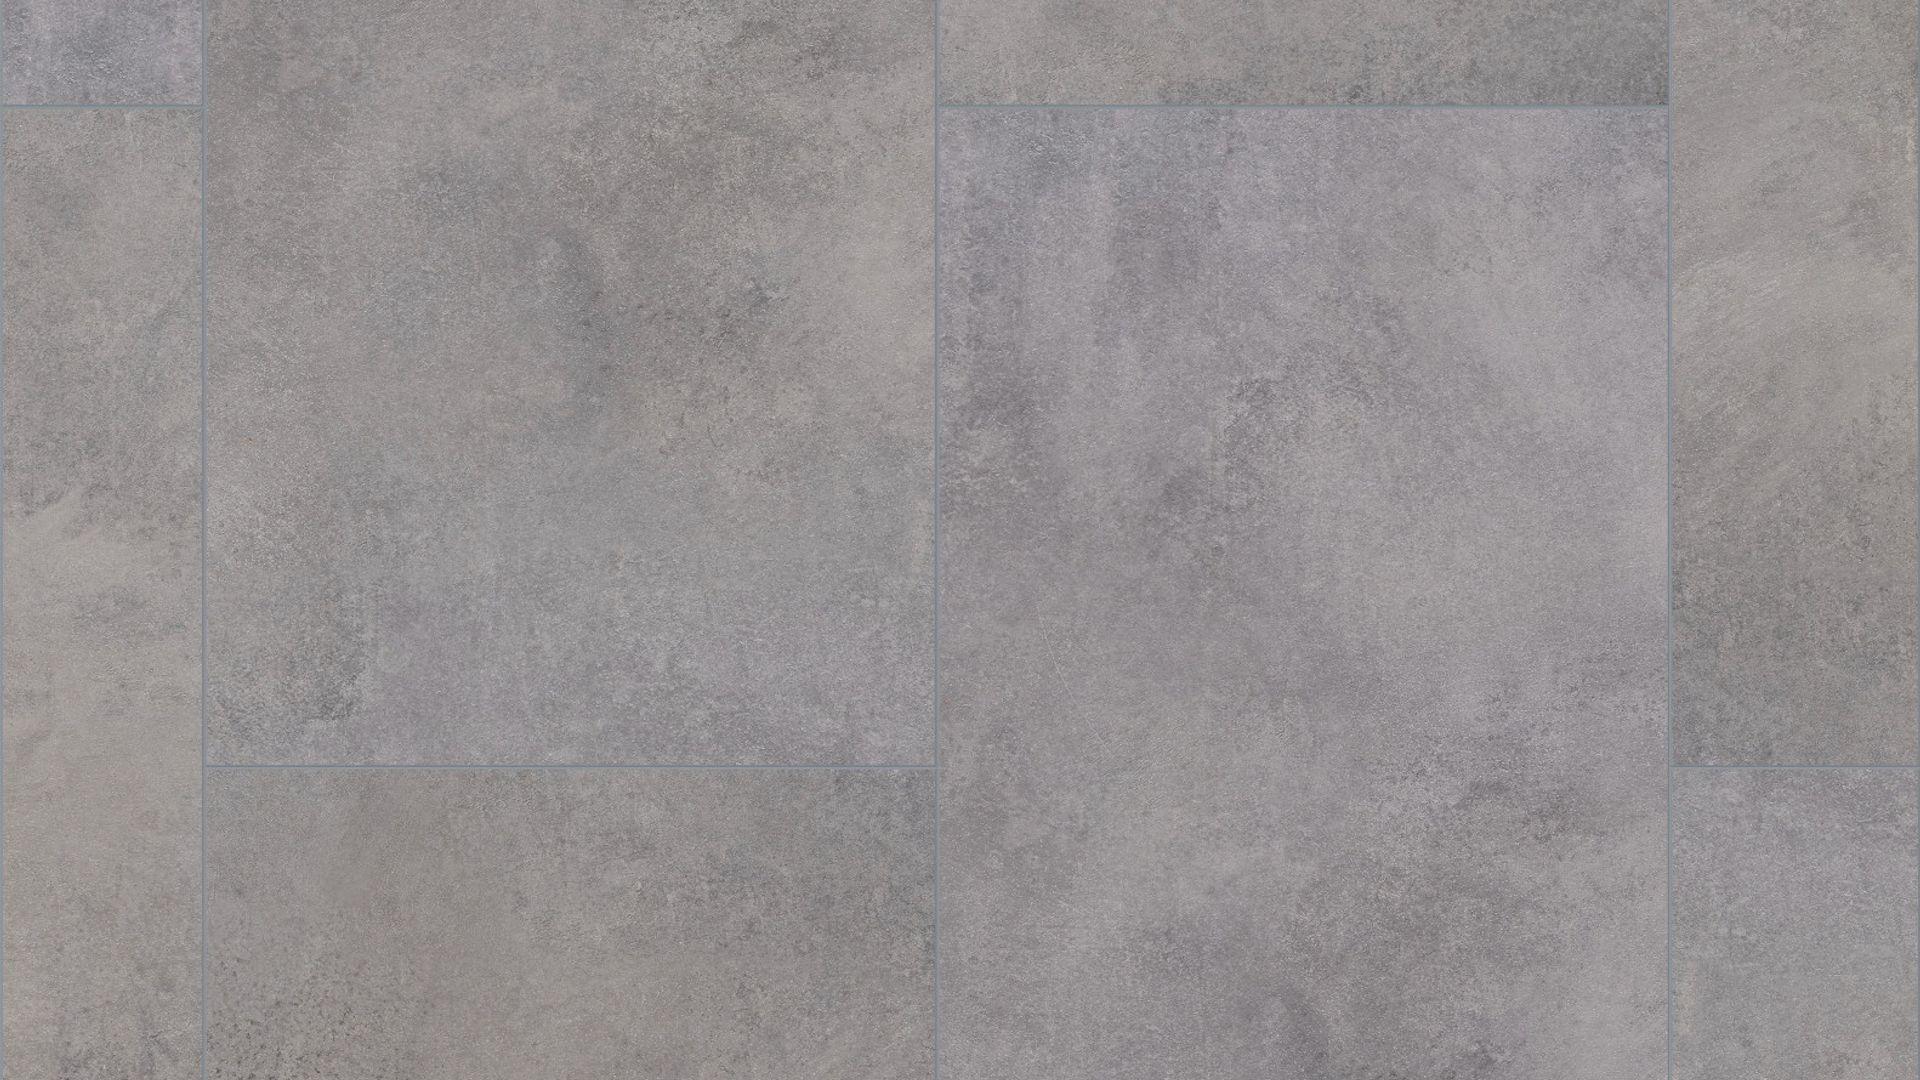 vesta vv568 18363 evp vinyl tile flooring coretec